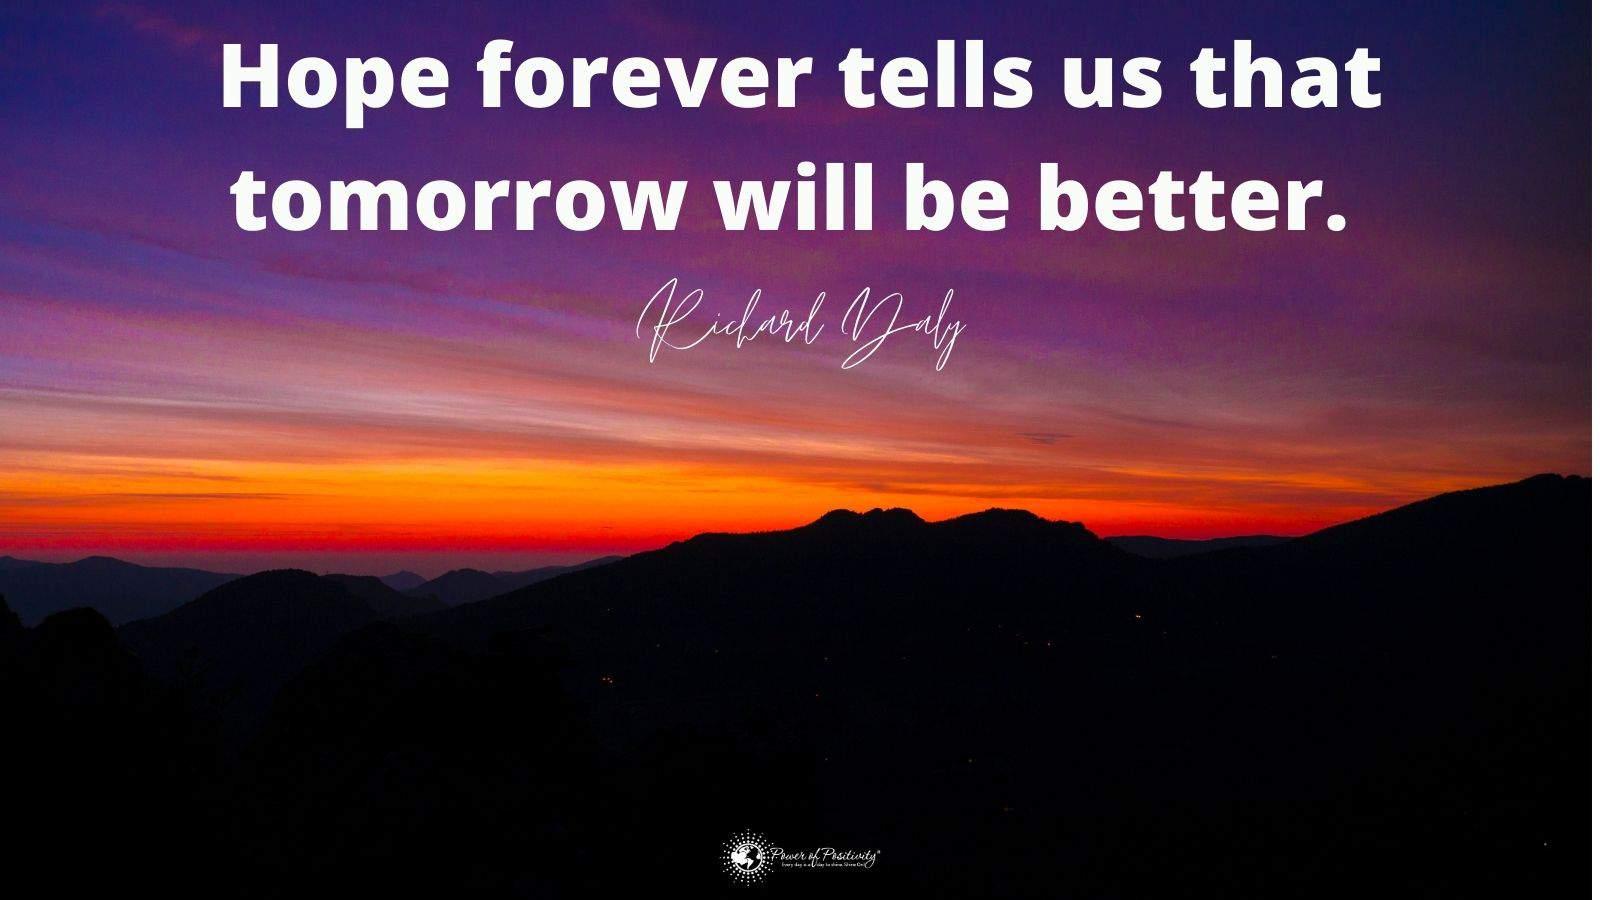 hopeful quote